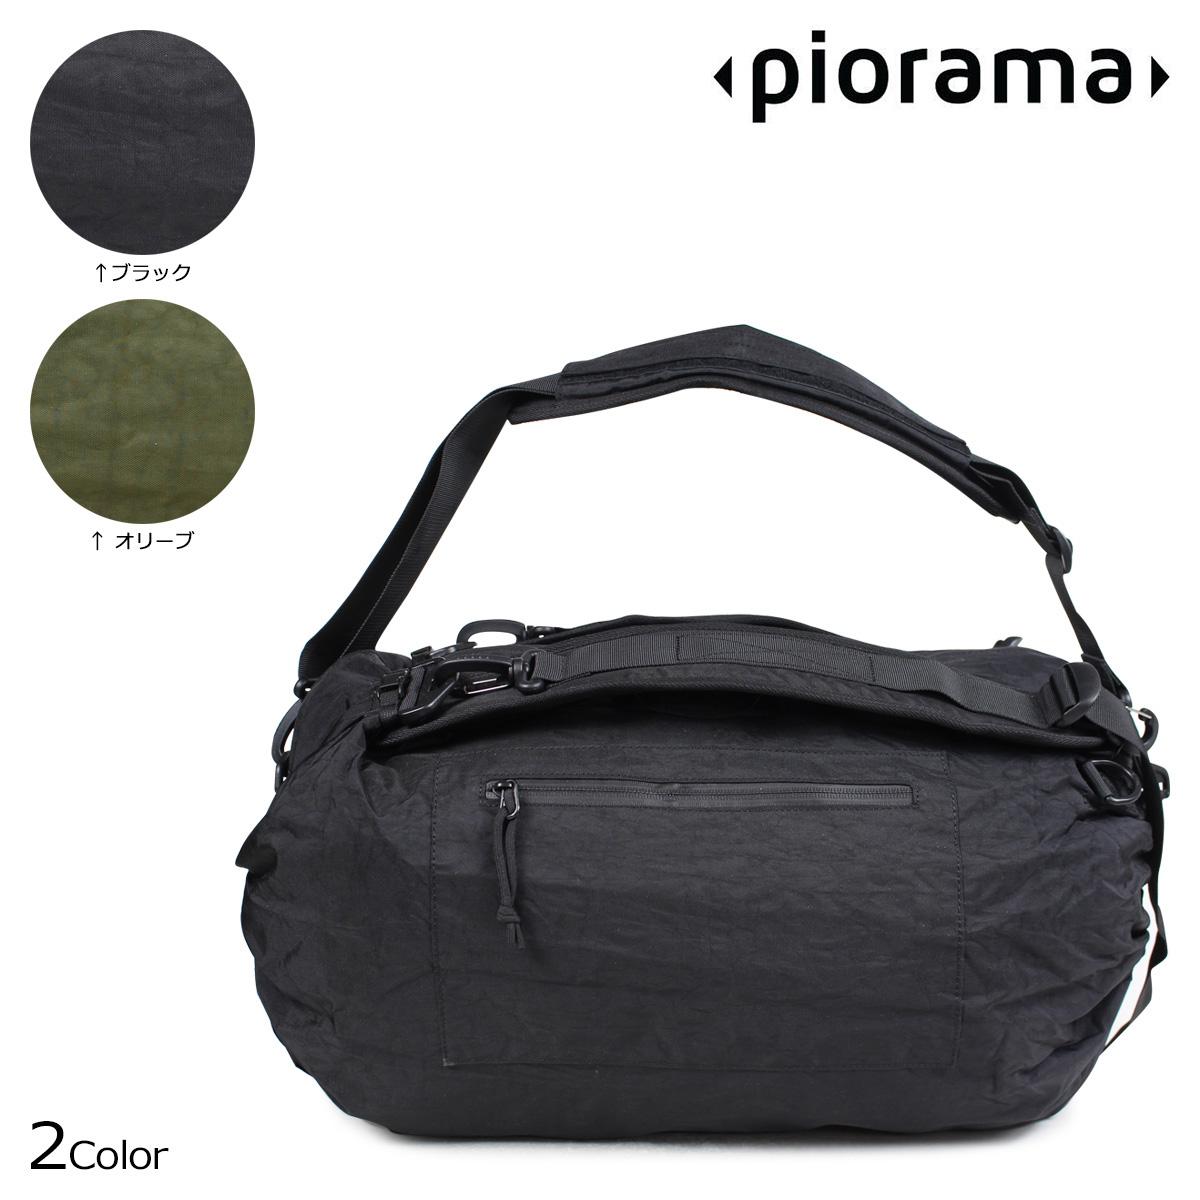 PIORAMA ピオラマ A10 バッグ ショルダーバッグ バックパック ボストン 31L 46.5L 62L THE ADIUSTABLE BAG メンズ レディース ブラック オリーブ